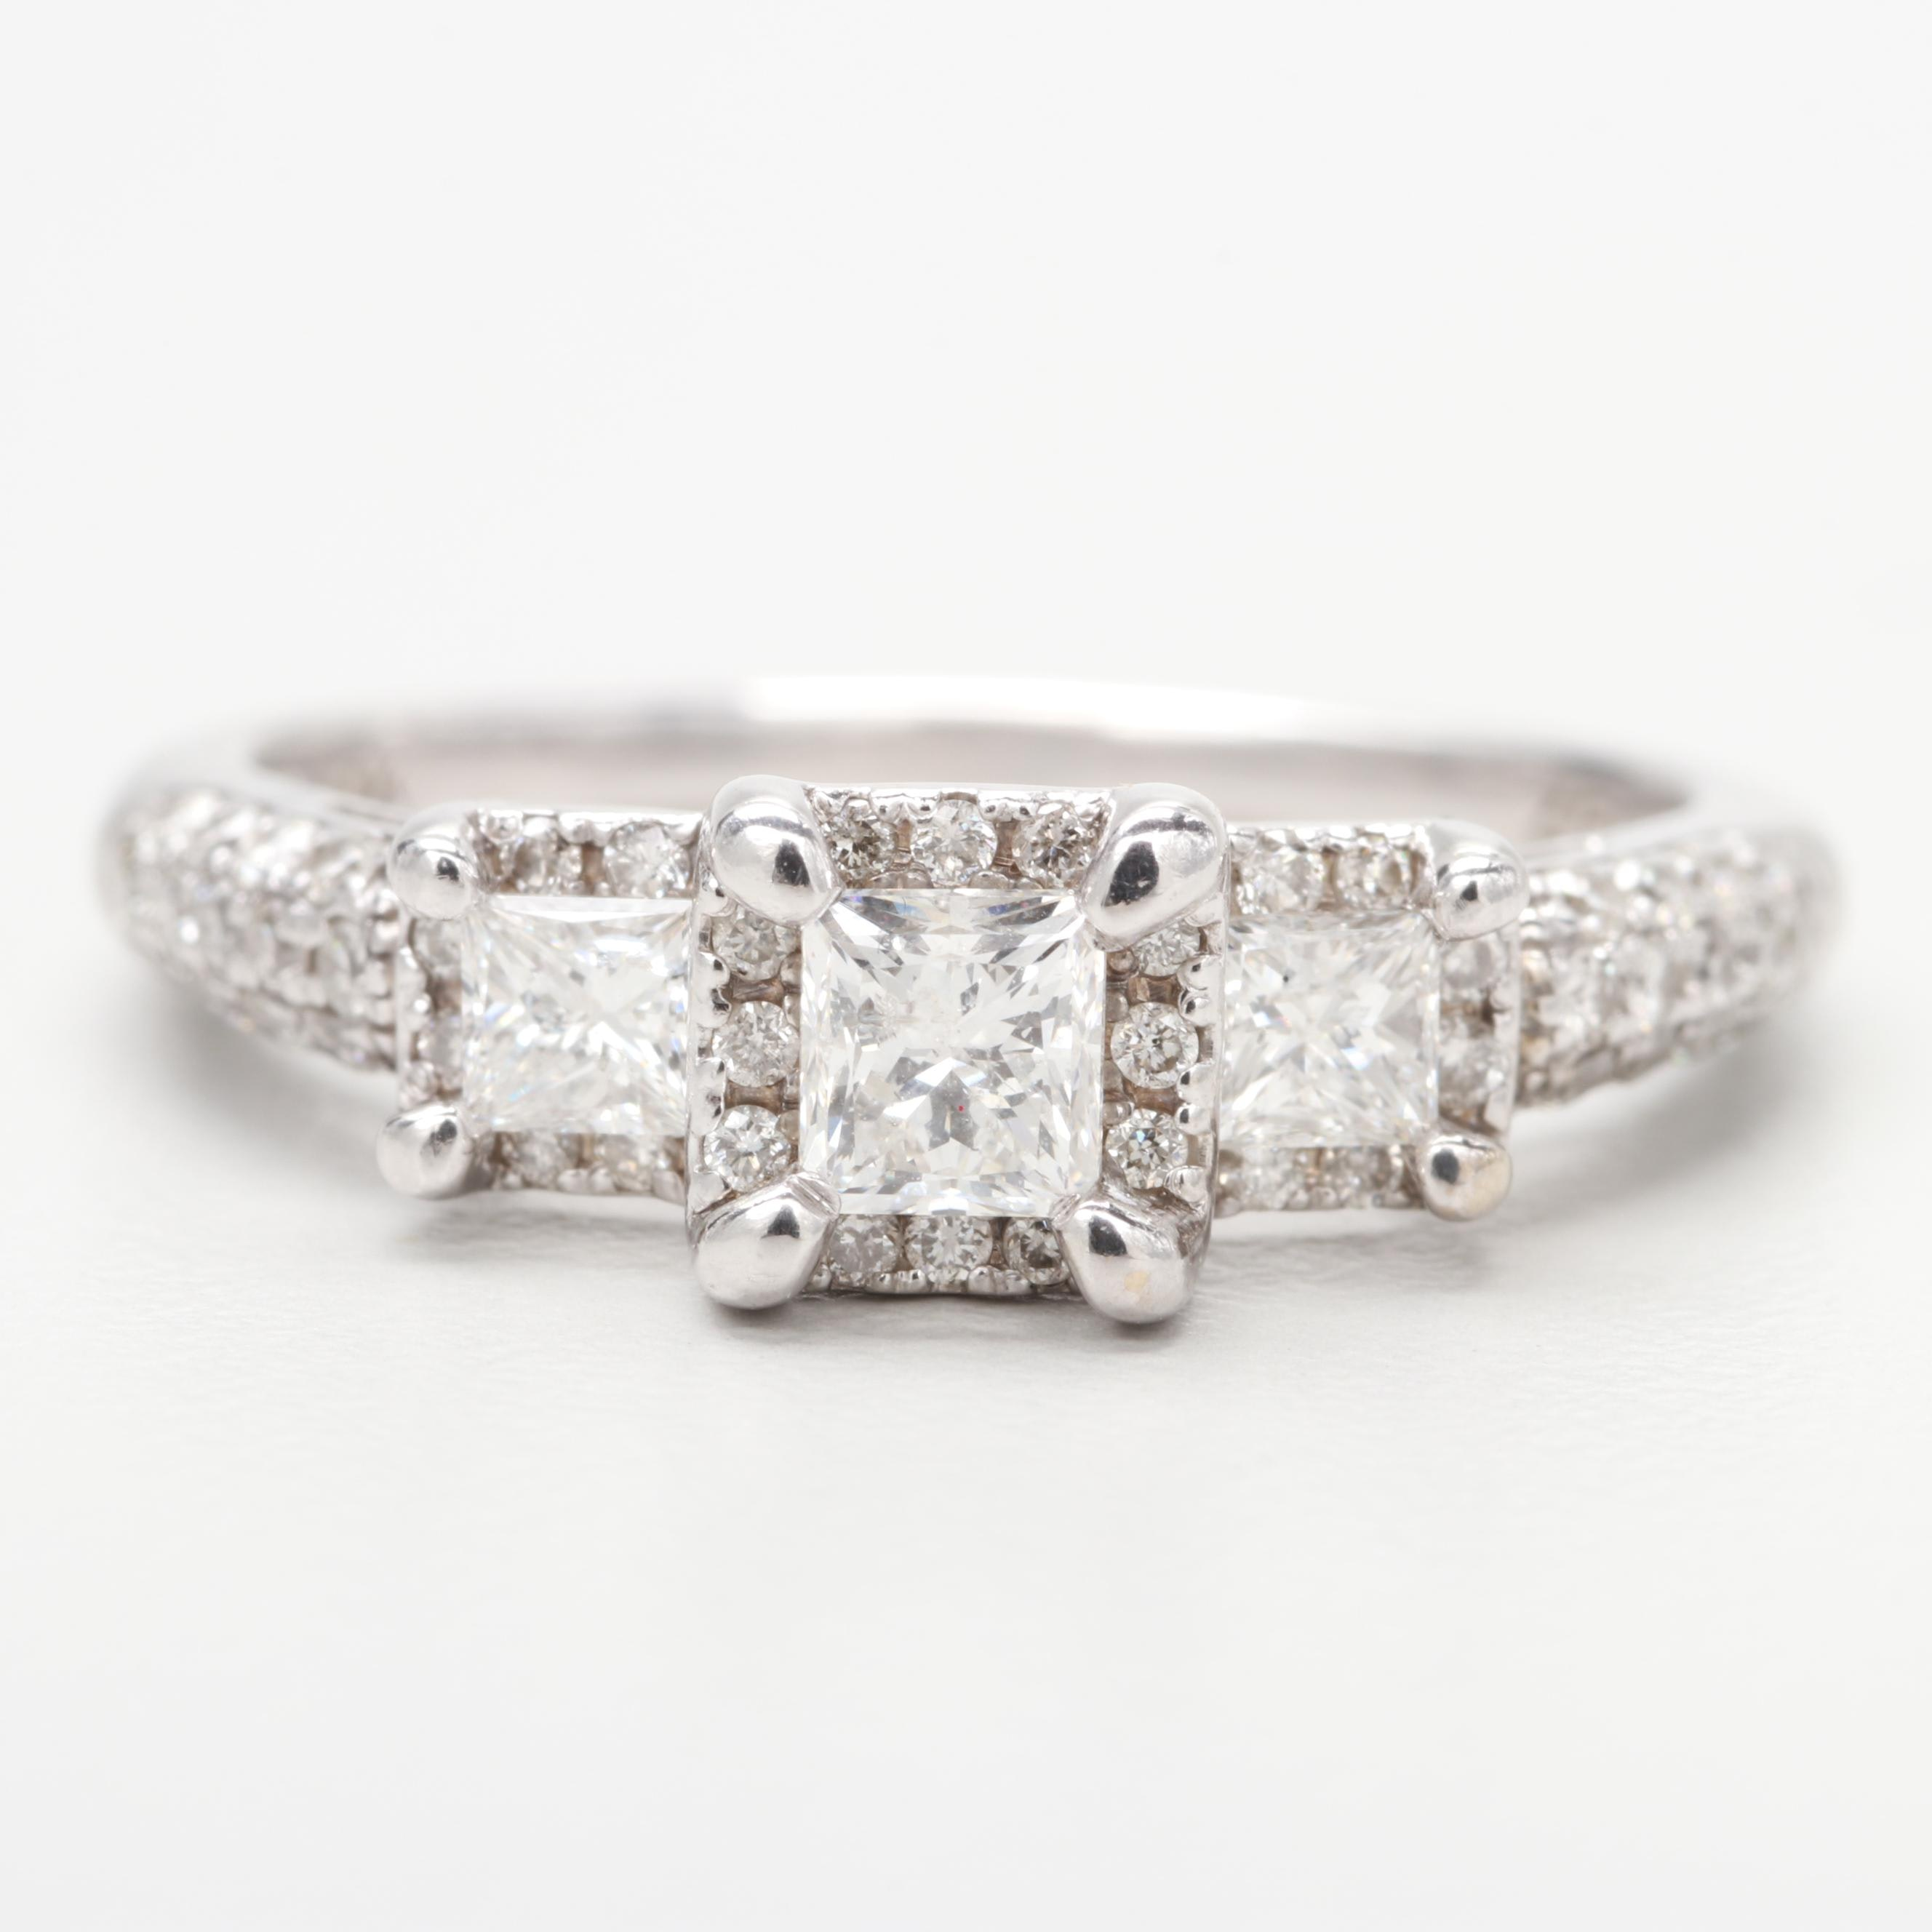 14K White Gold 1.03 CTW Diamond Ring